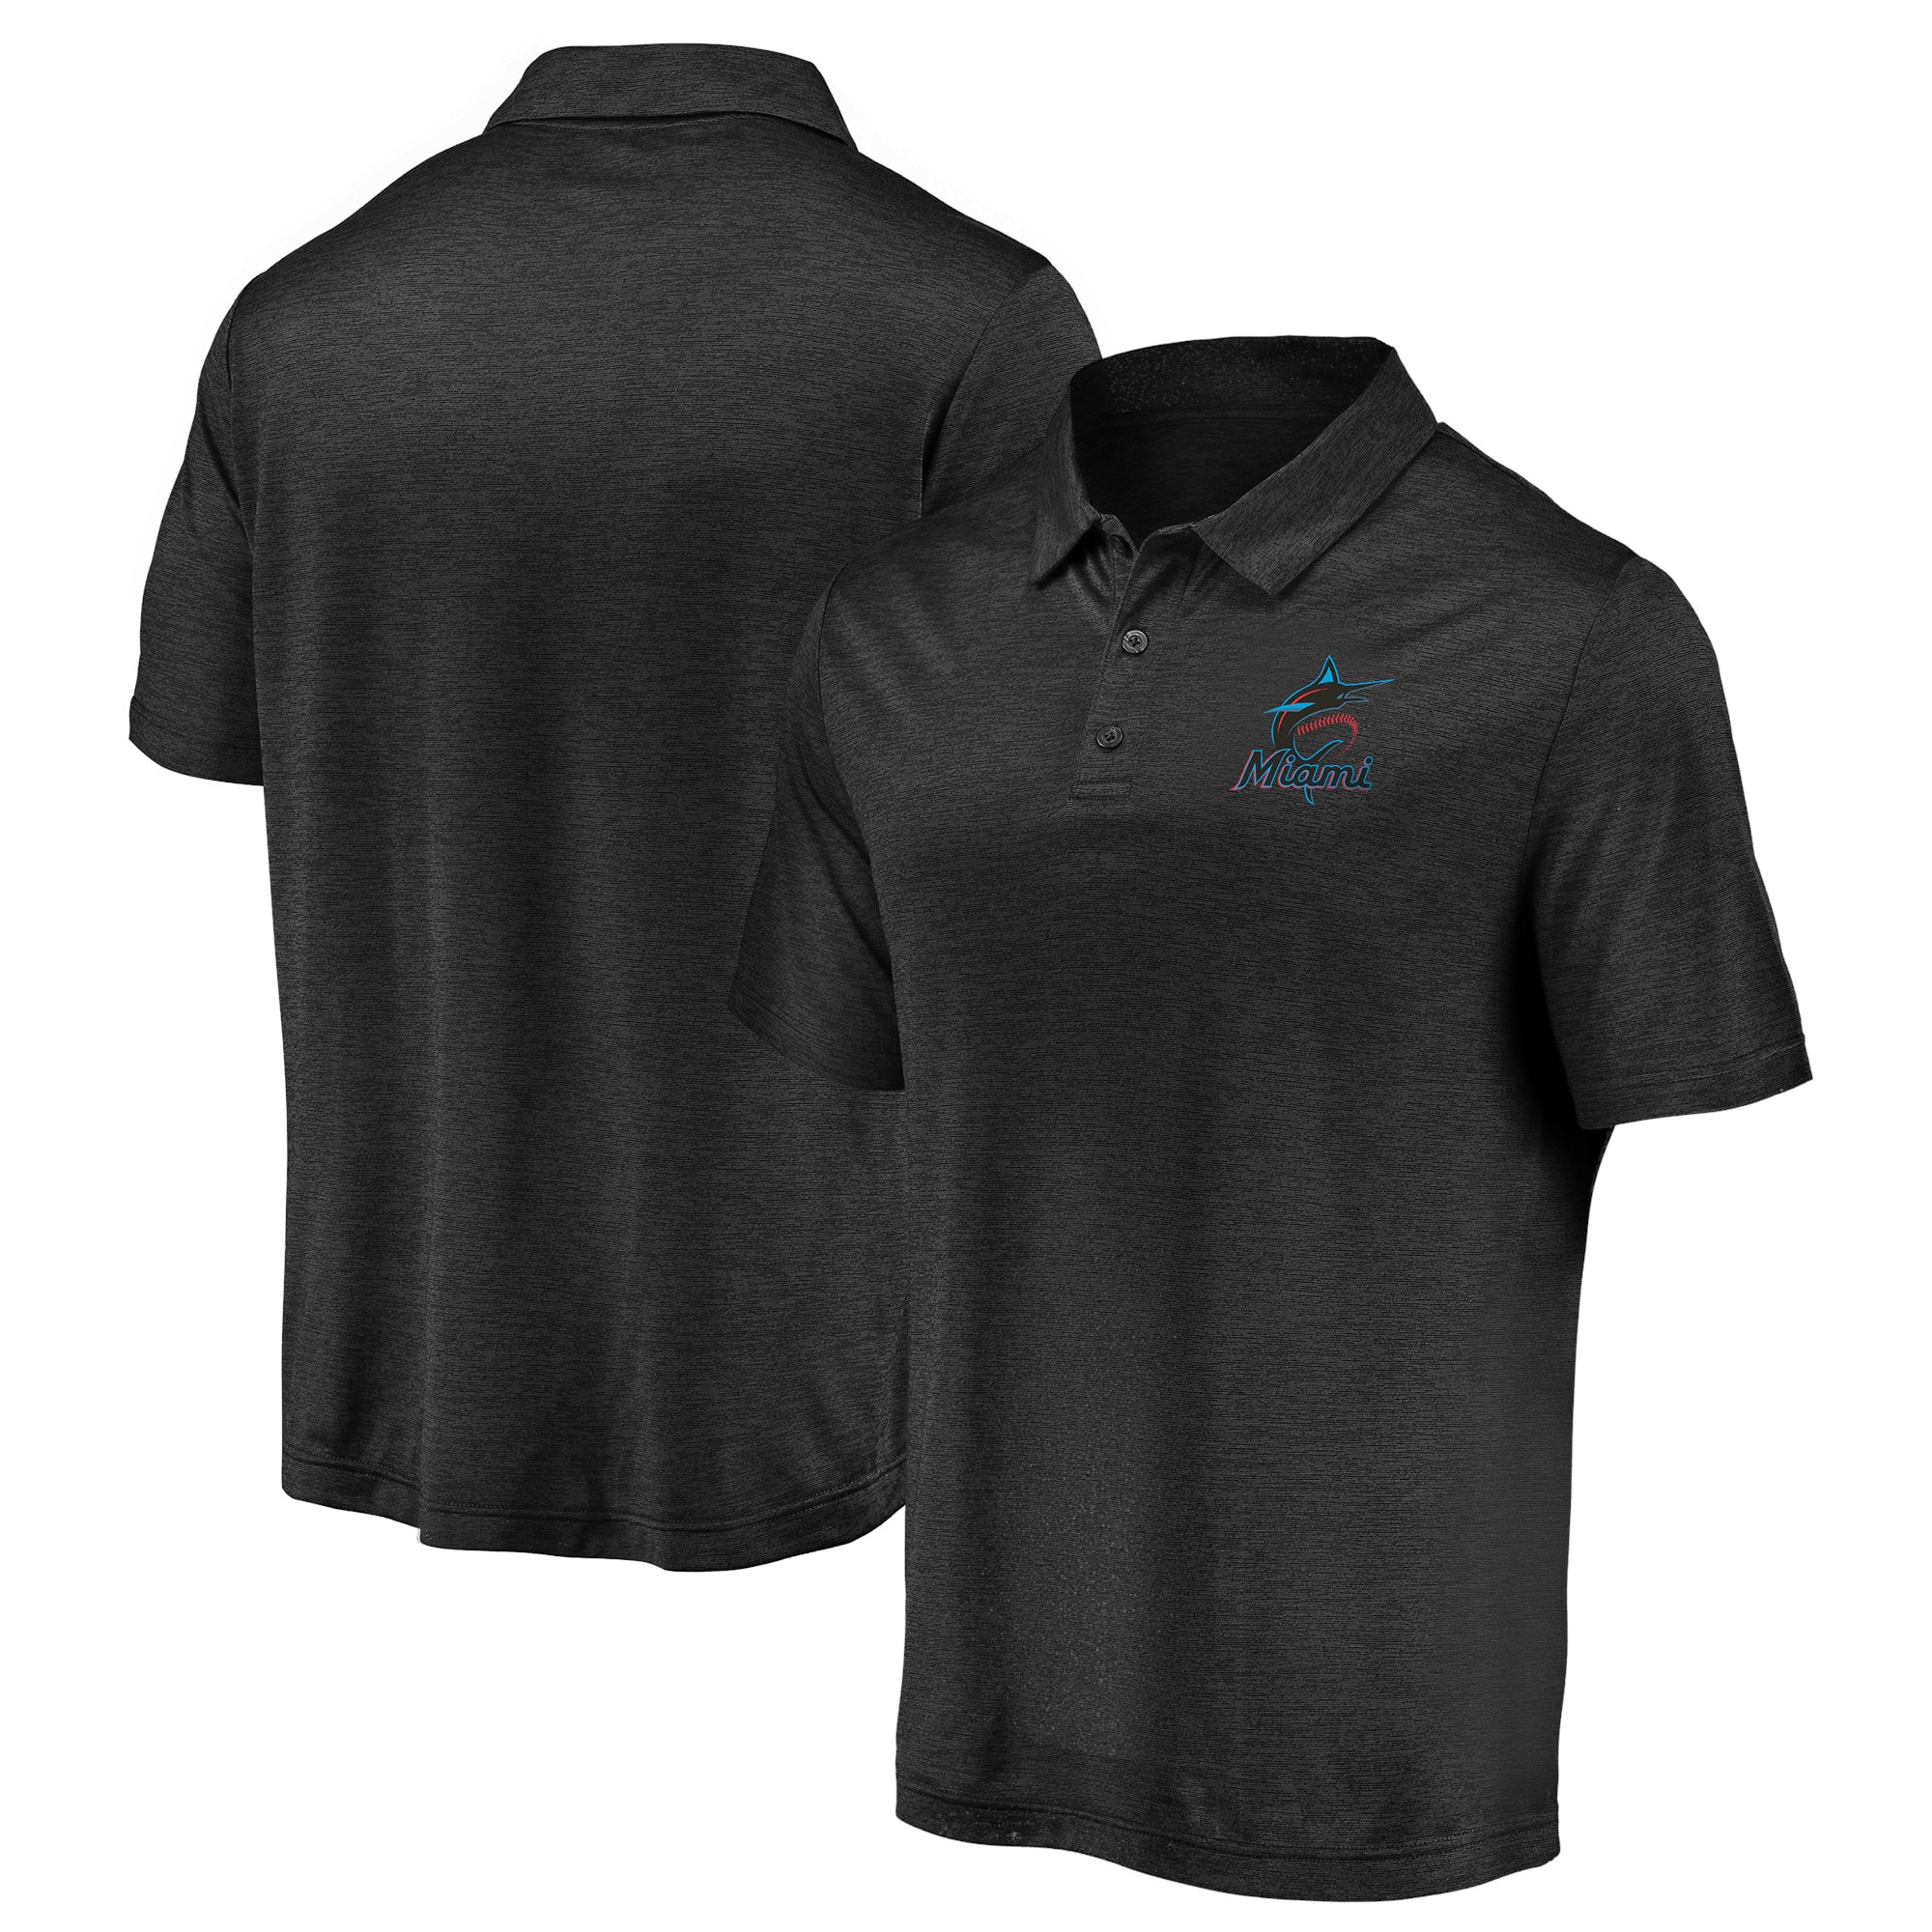 Miami Marlins Fanatics Branded Iconic Striated Primary Logo Polo - Black